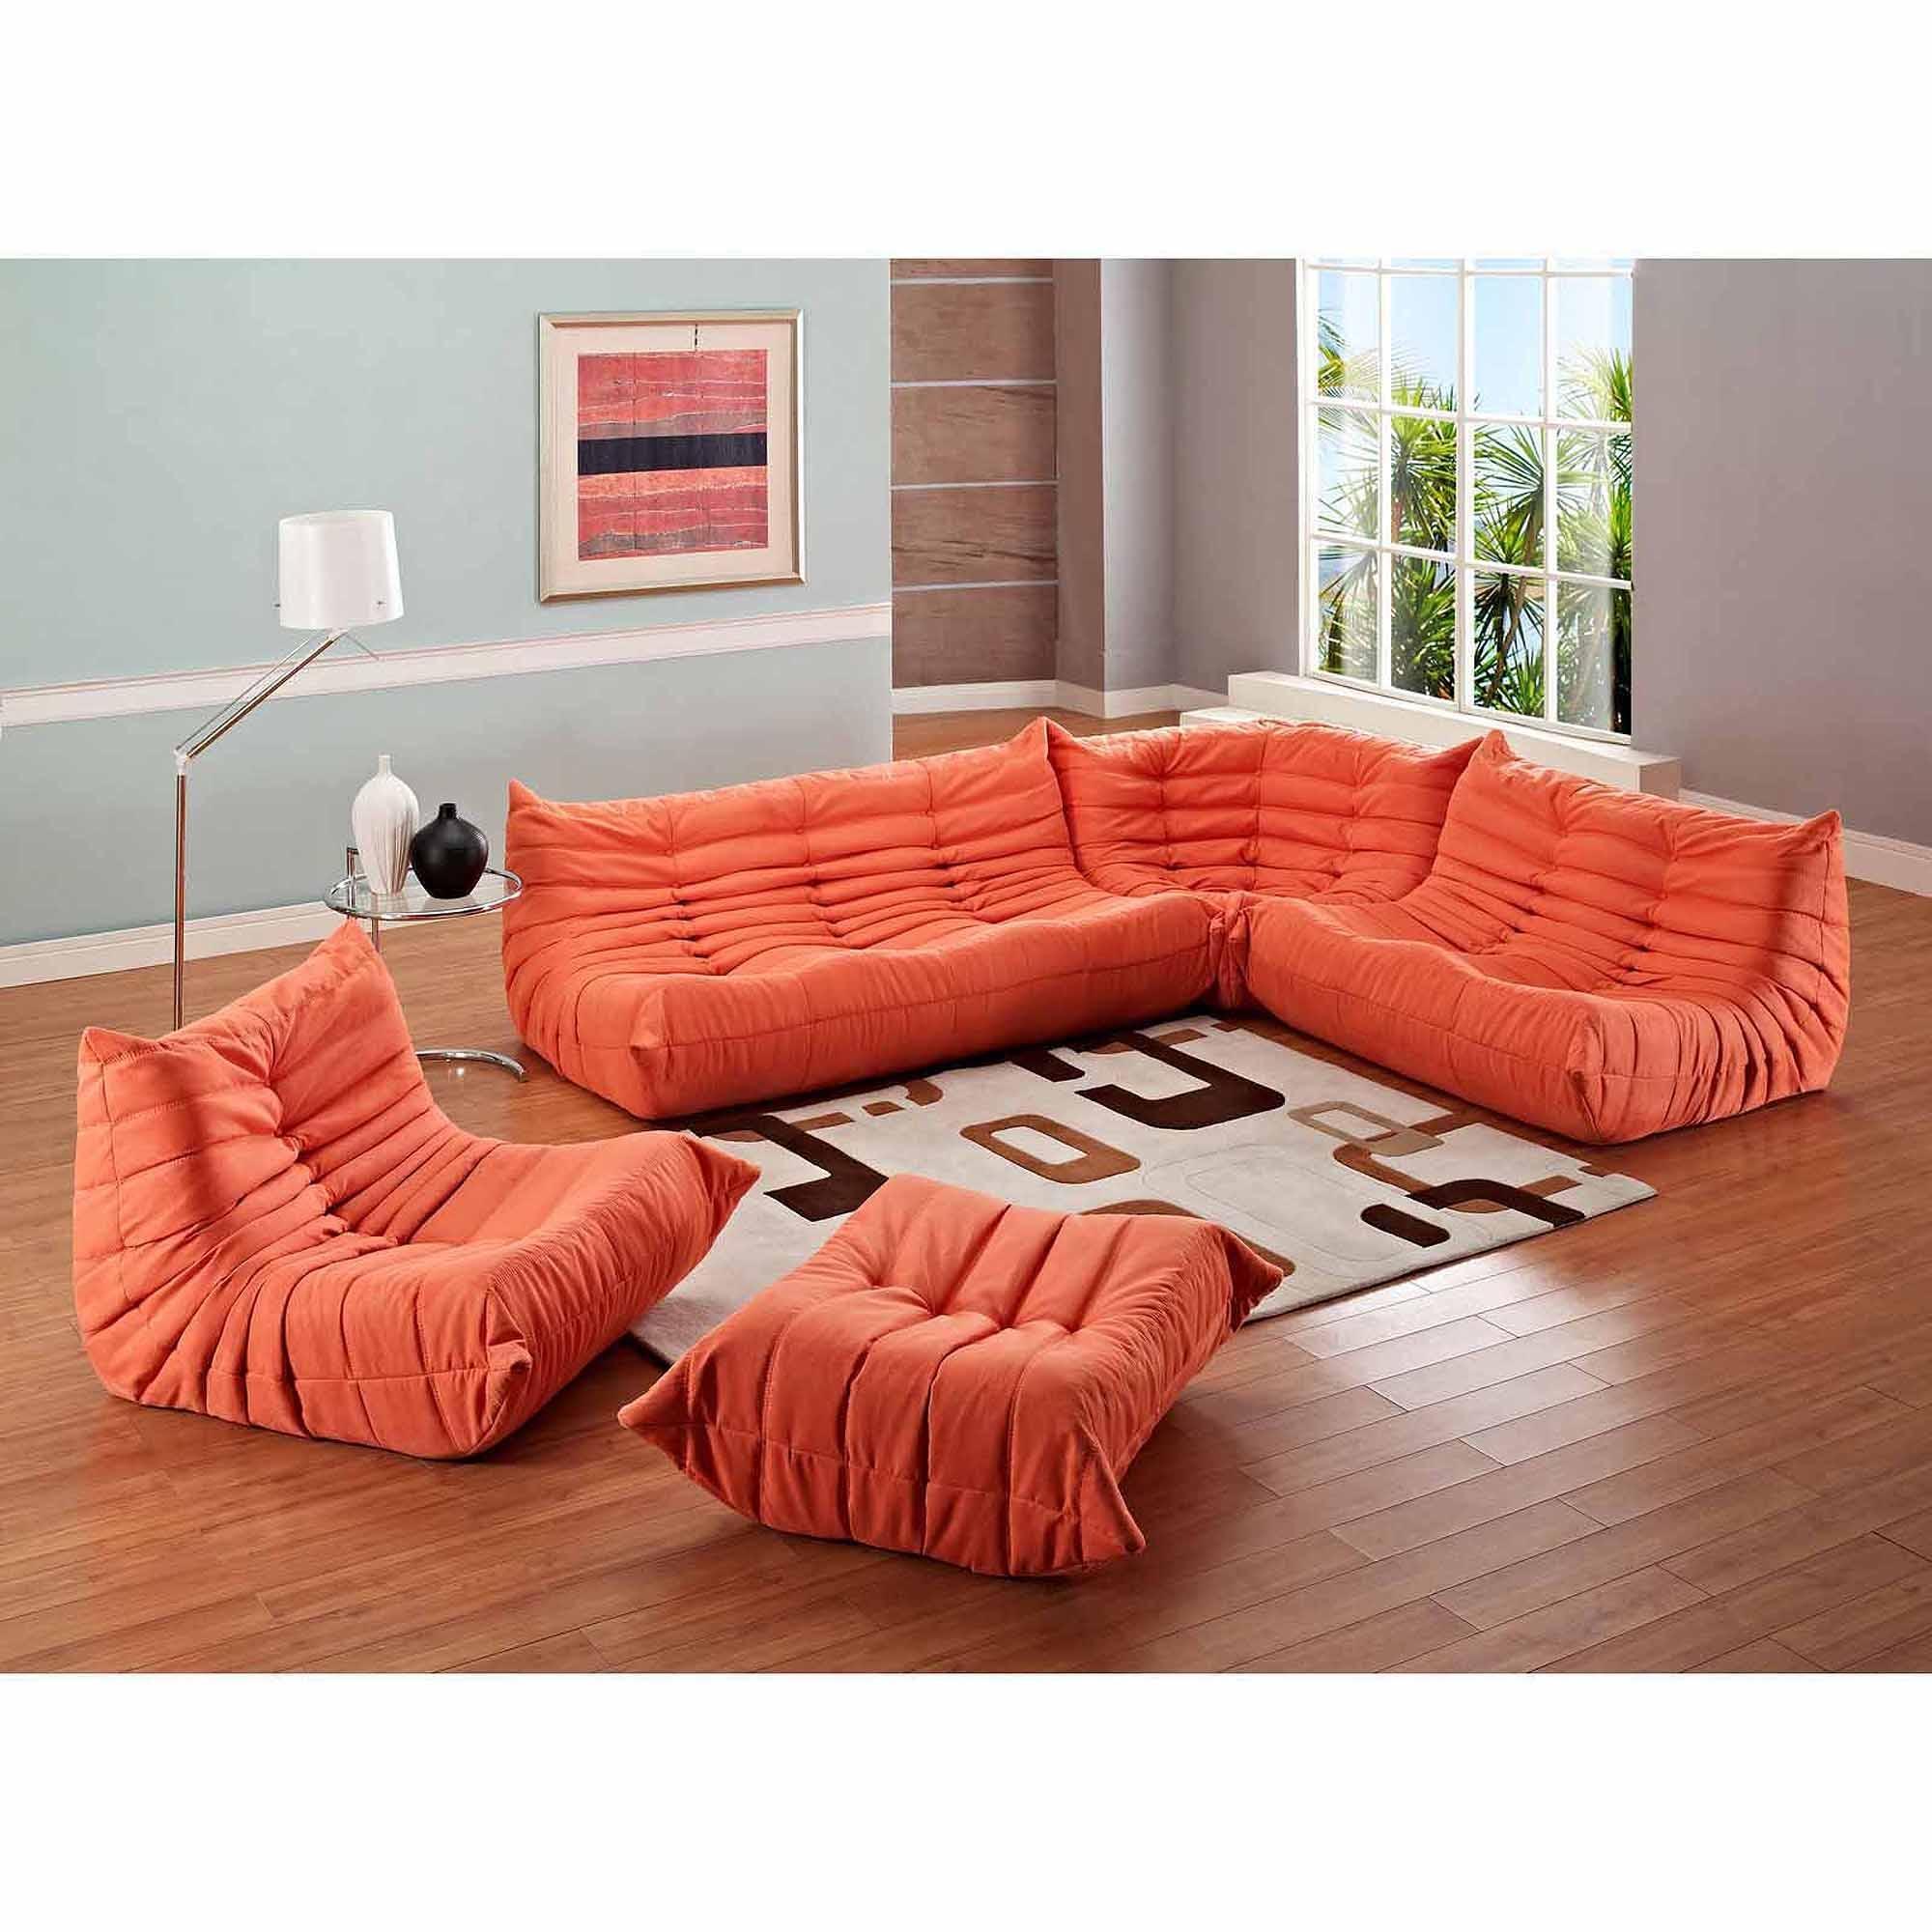 Modway Waverunner Modular Sectional Sofa Set (5 Piece) – Walmart Intended For Orange Sectional Sofas (Image 17 of 20)